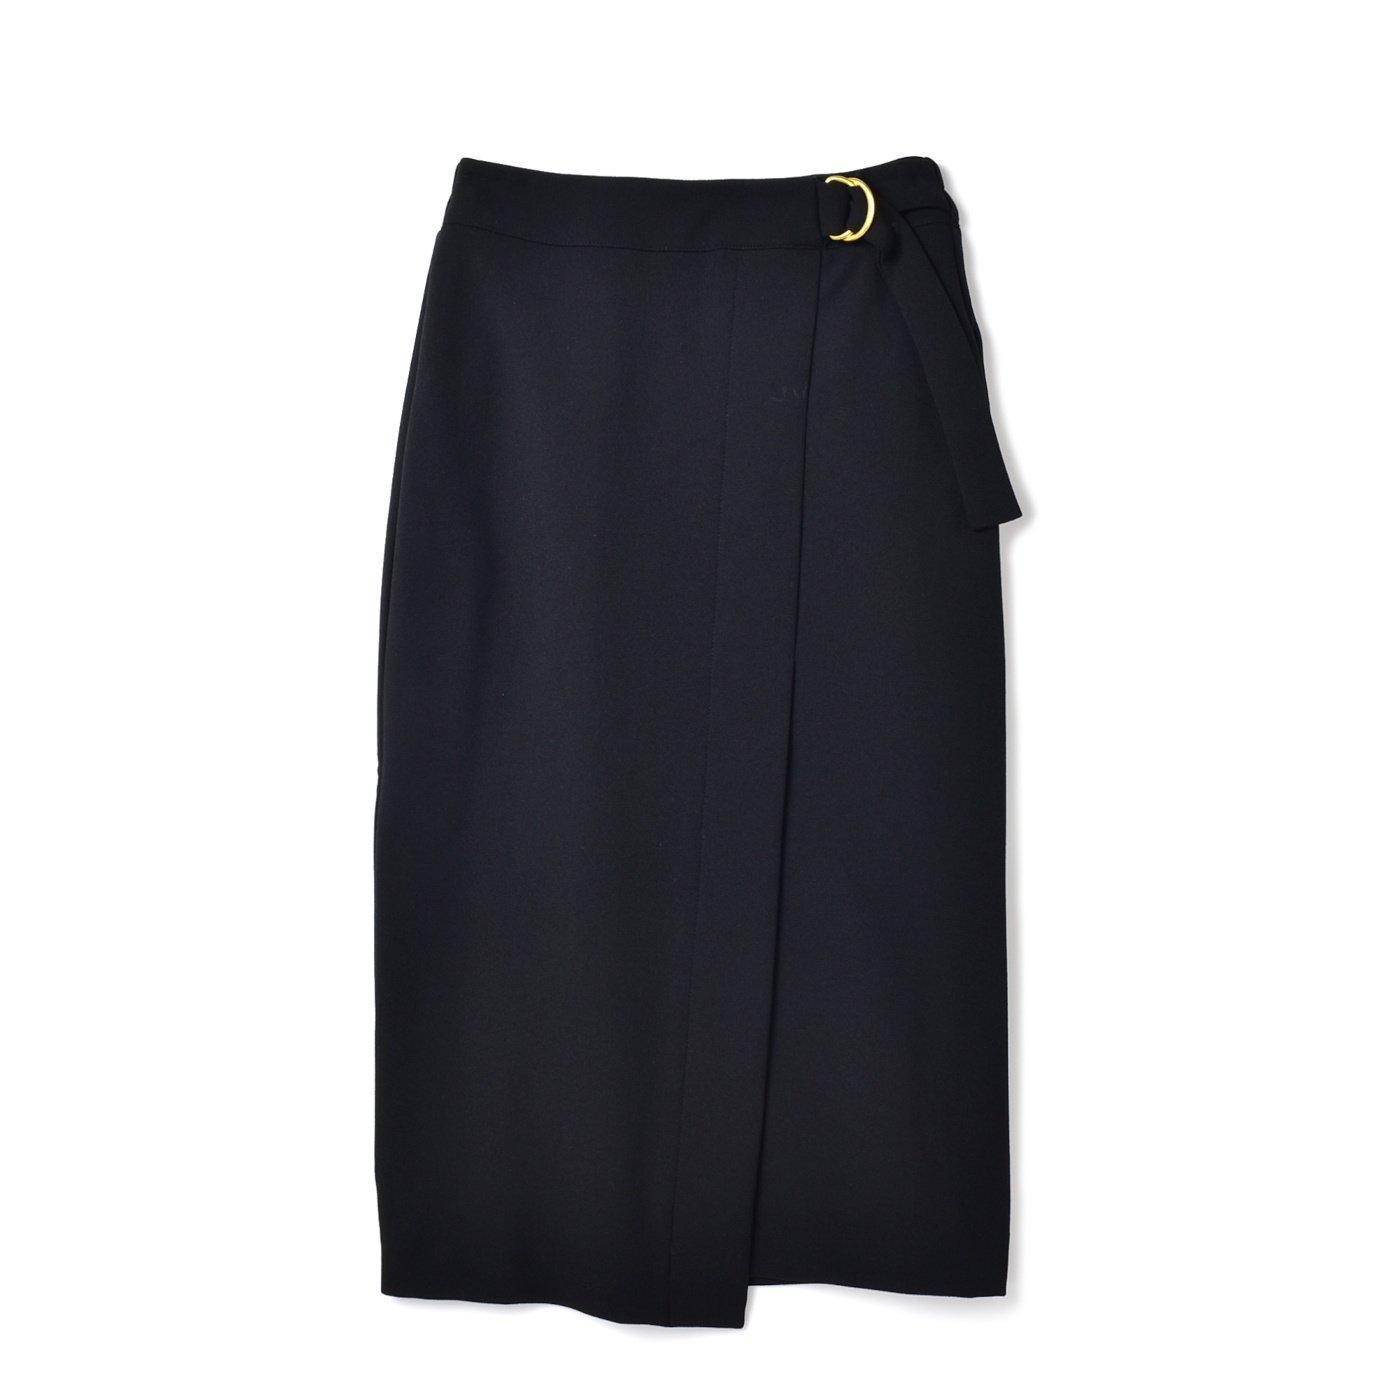 DRECO by IEDIT 上品ブラックスカート〈ブラック〉